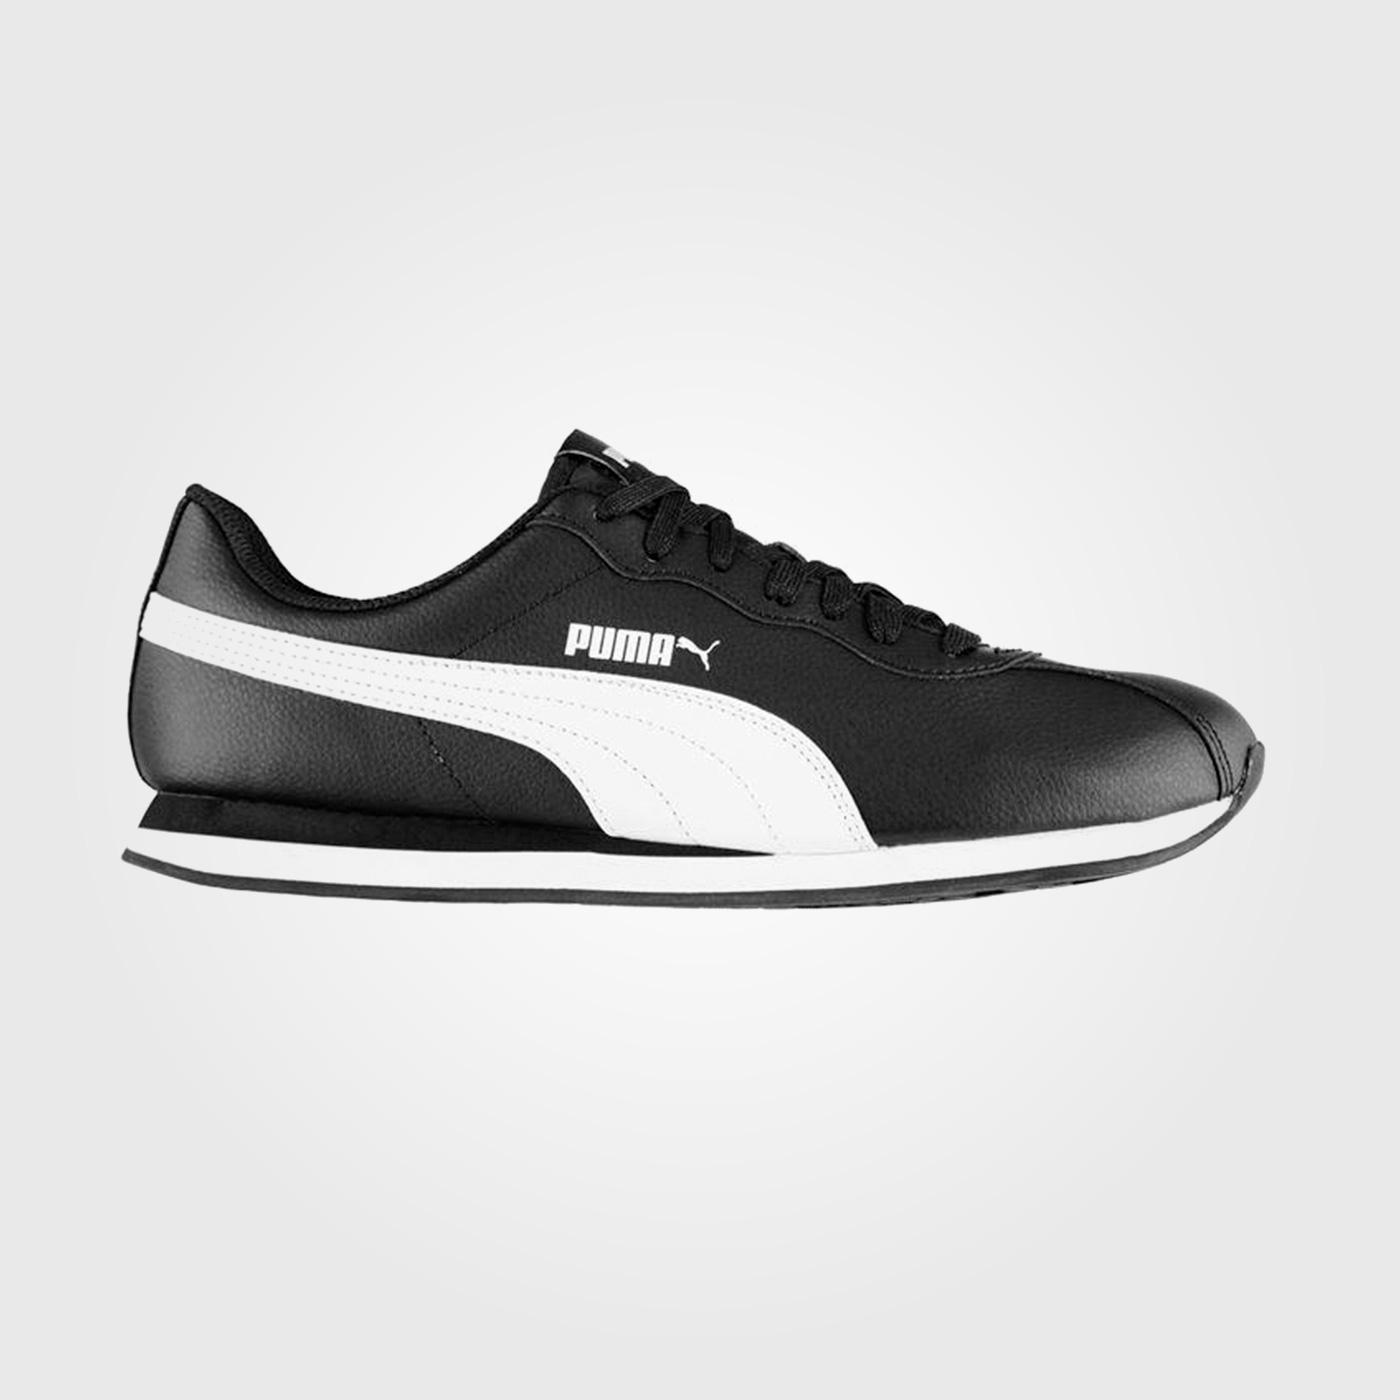 Кроссовки Puma Turin II Mens Black/White